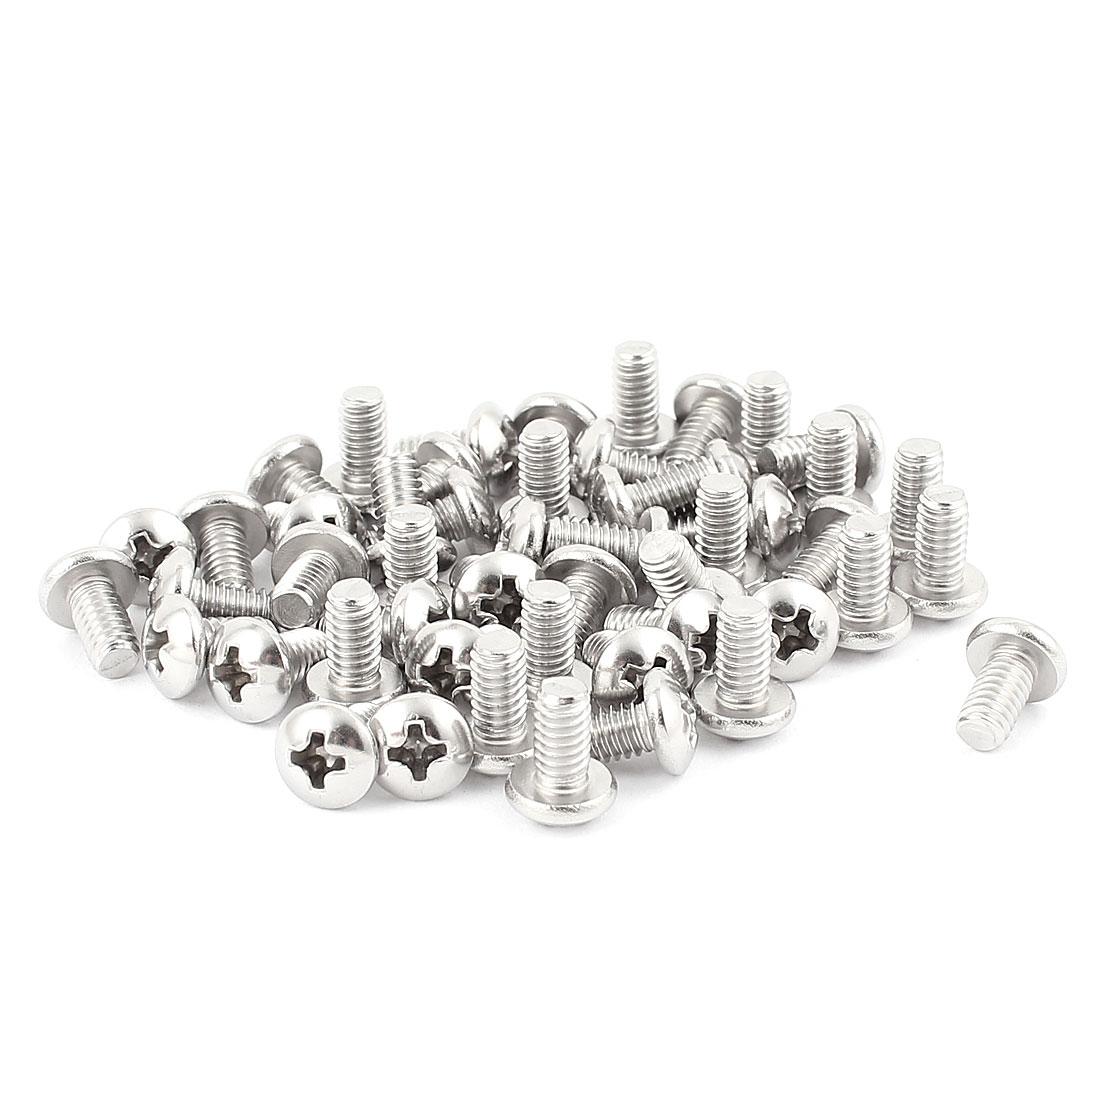 "50 Pcs Stainless Steel Phillips Truss Head Bolts Machine Screws #8-32 x 5/16"""